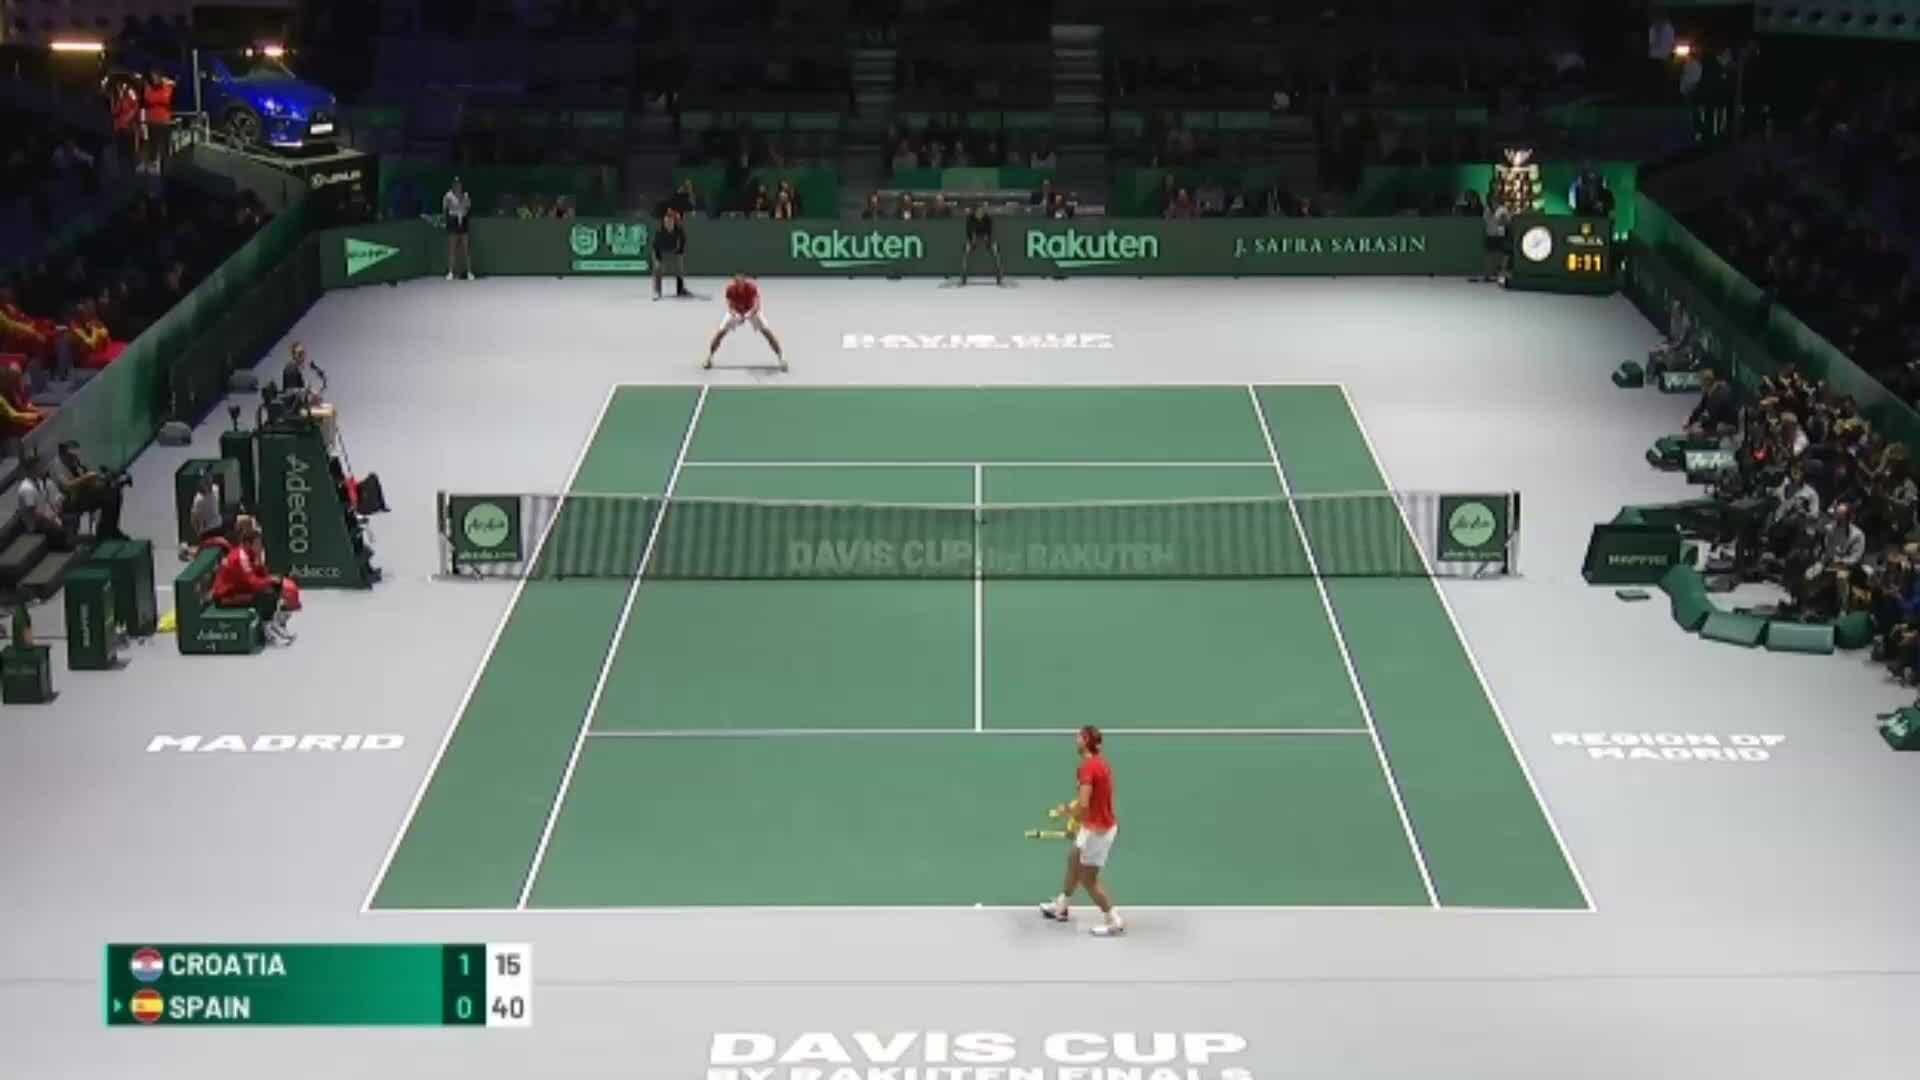 Rafael Nadal 2-0 Borna Gojo